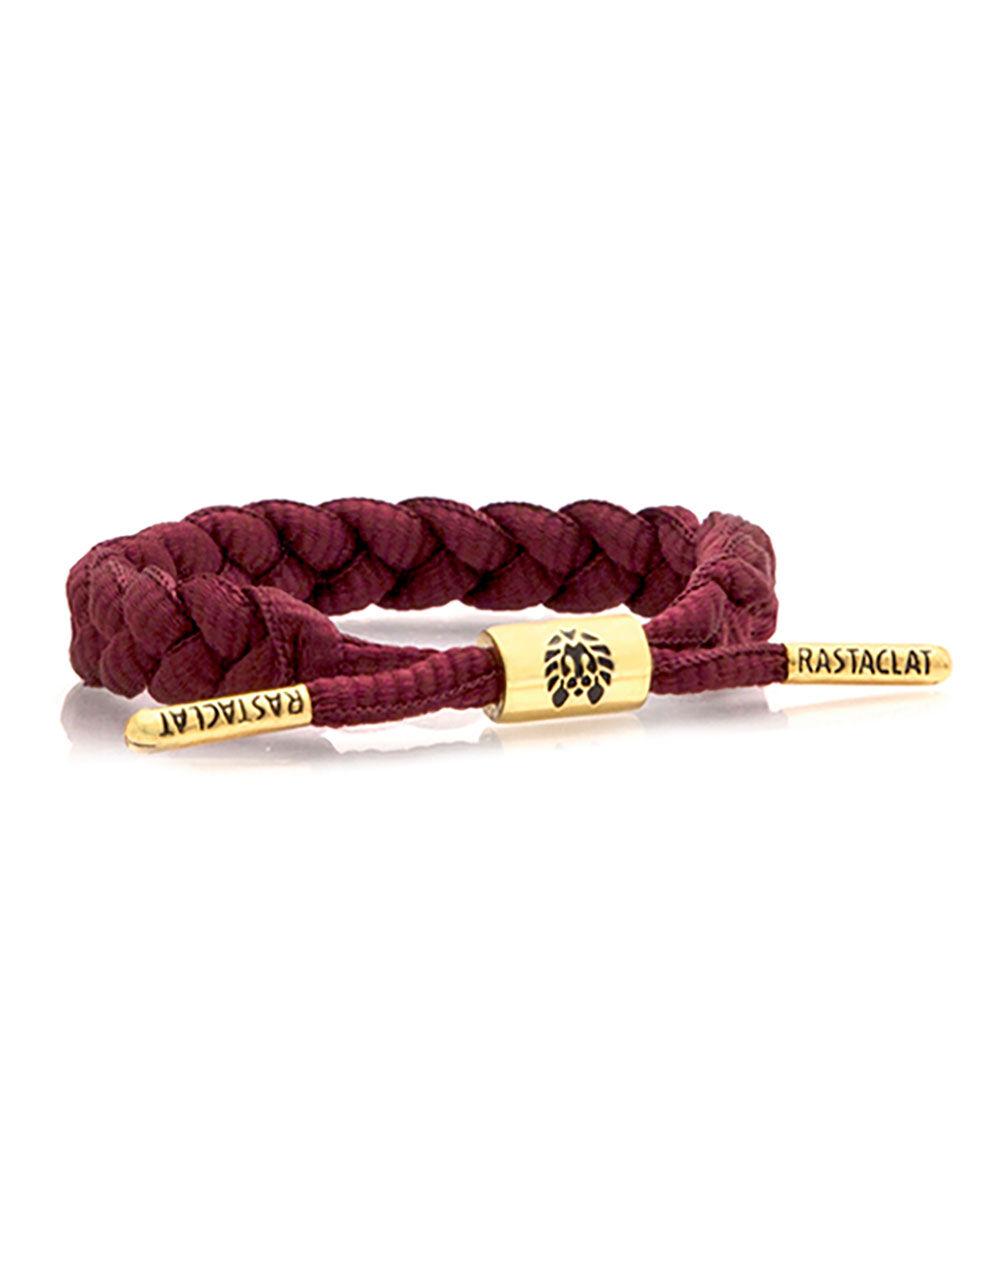 RASTACLAT Merlot Bracelet